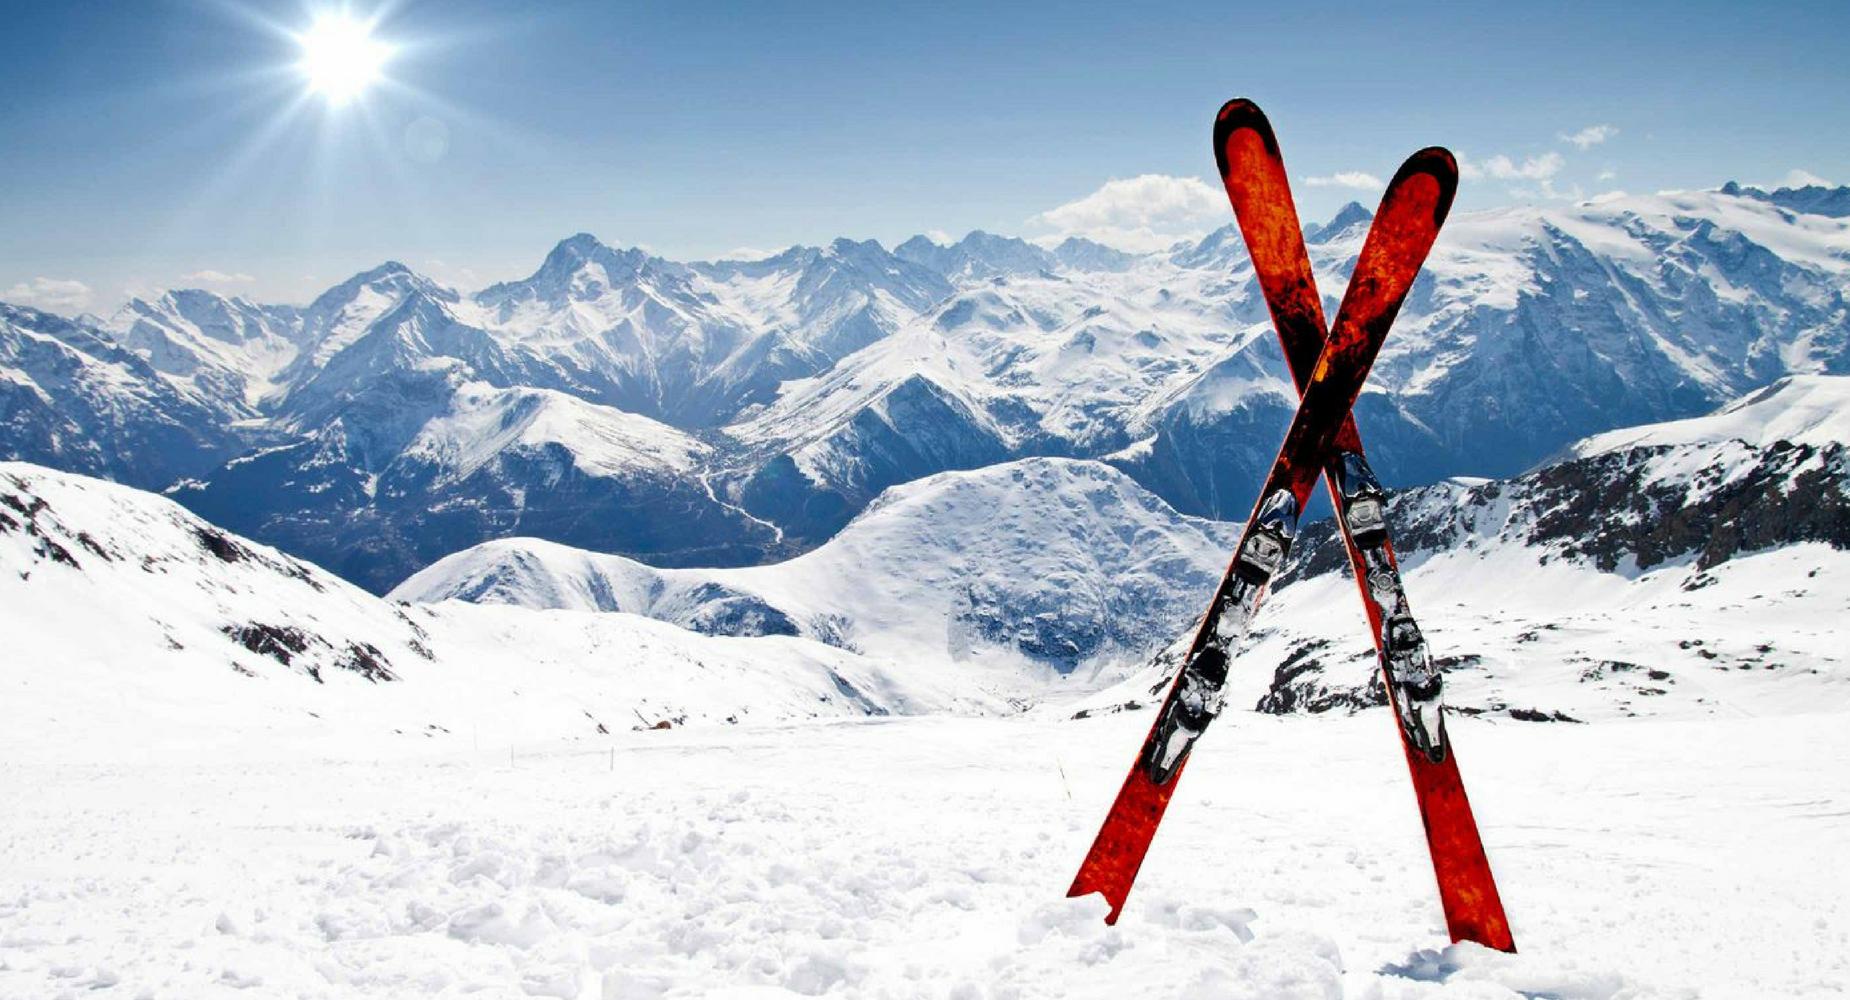 Sortie de ski, snowboard et de raquette